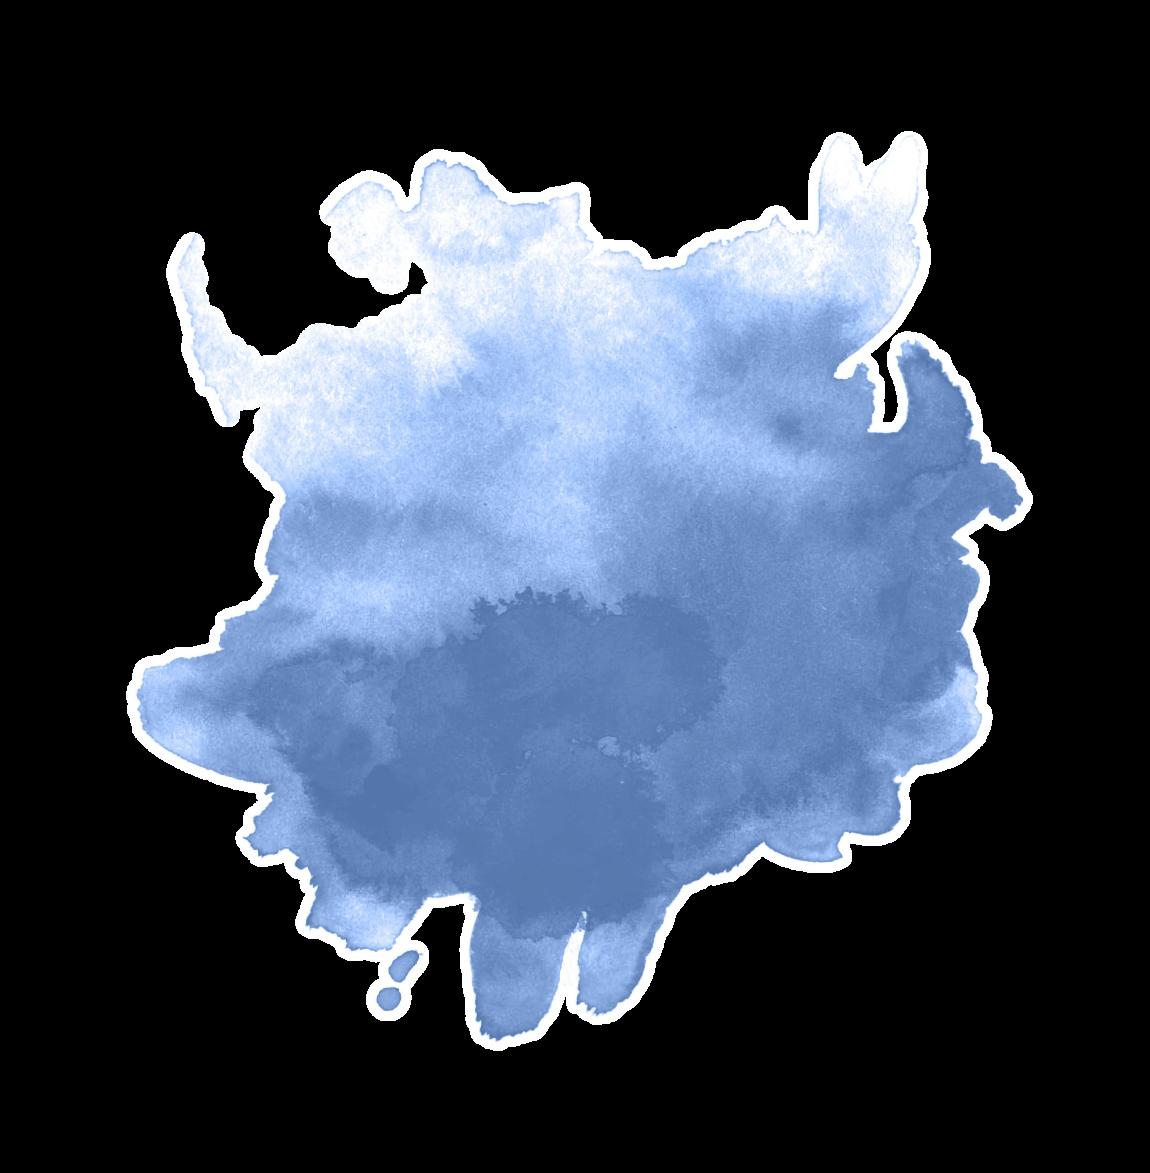 Background image of a paint splash